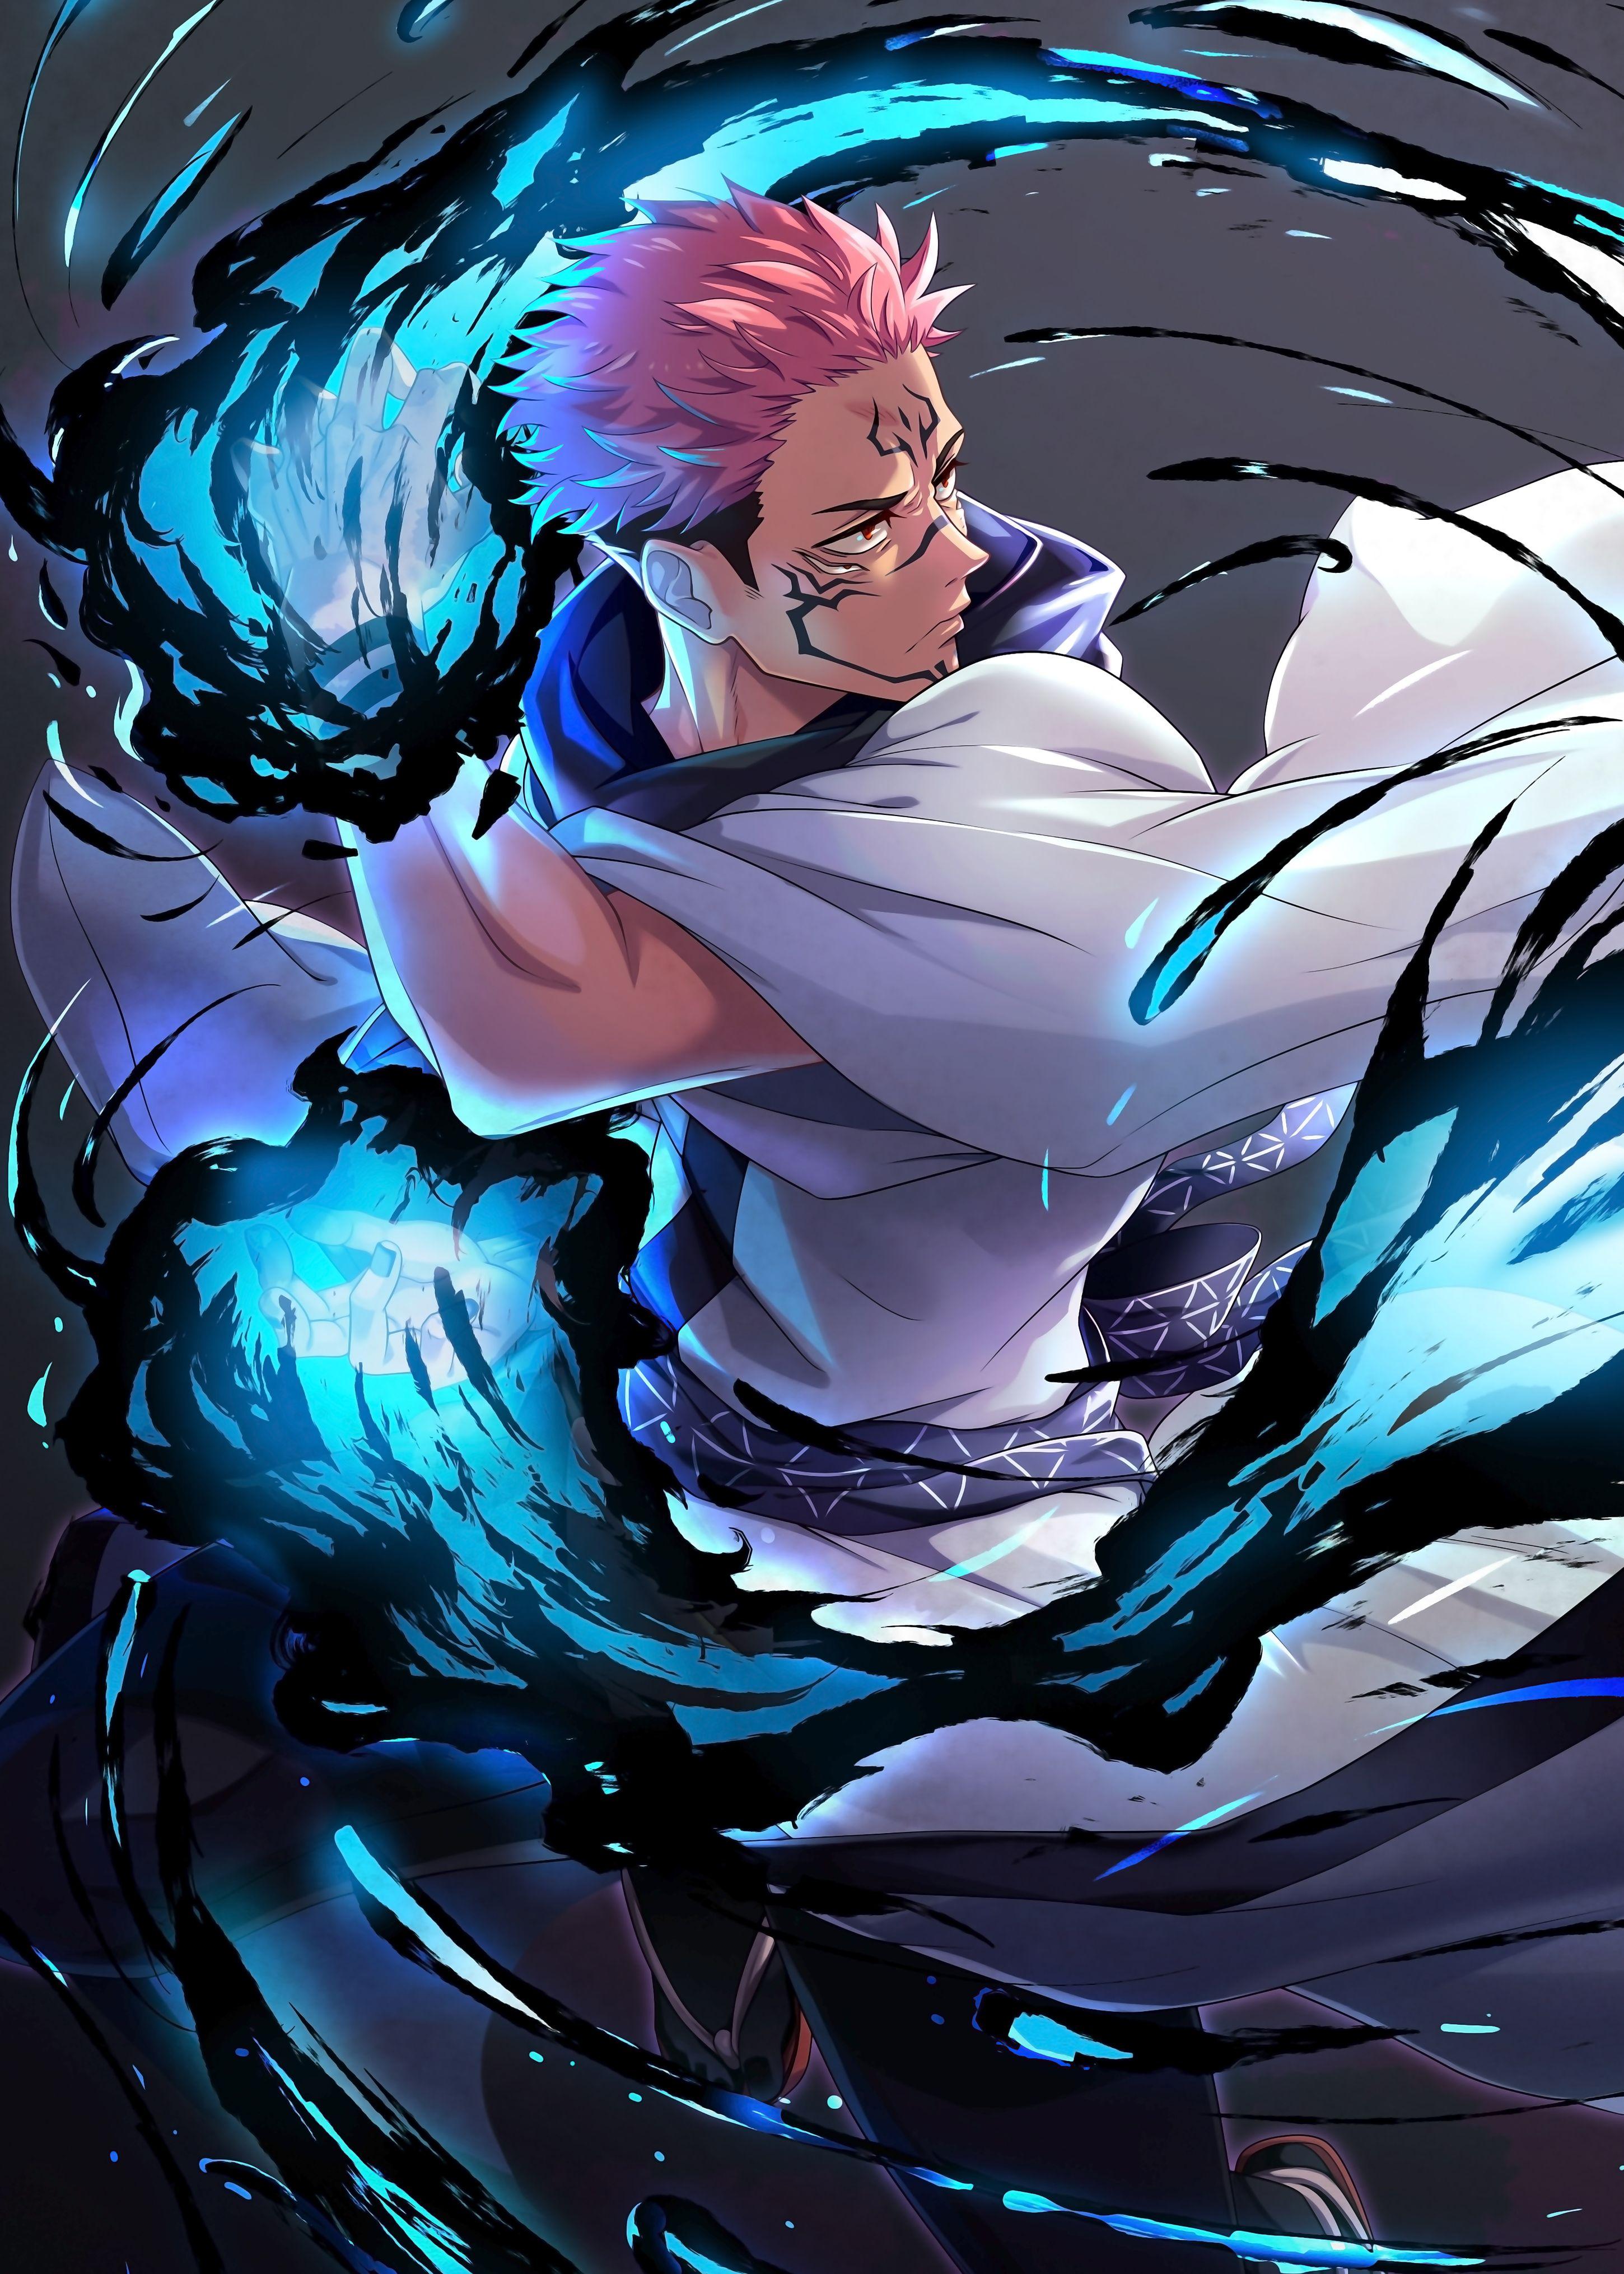 Jujutsu Kaisen Sukuna Poster By Terpres In 2021 Jujutsu Cool Anime Pictures Anime Films